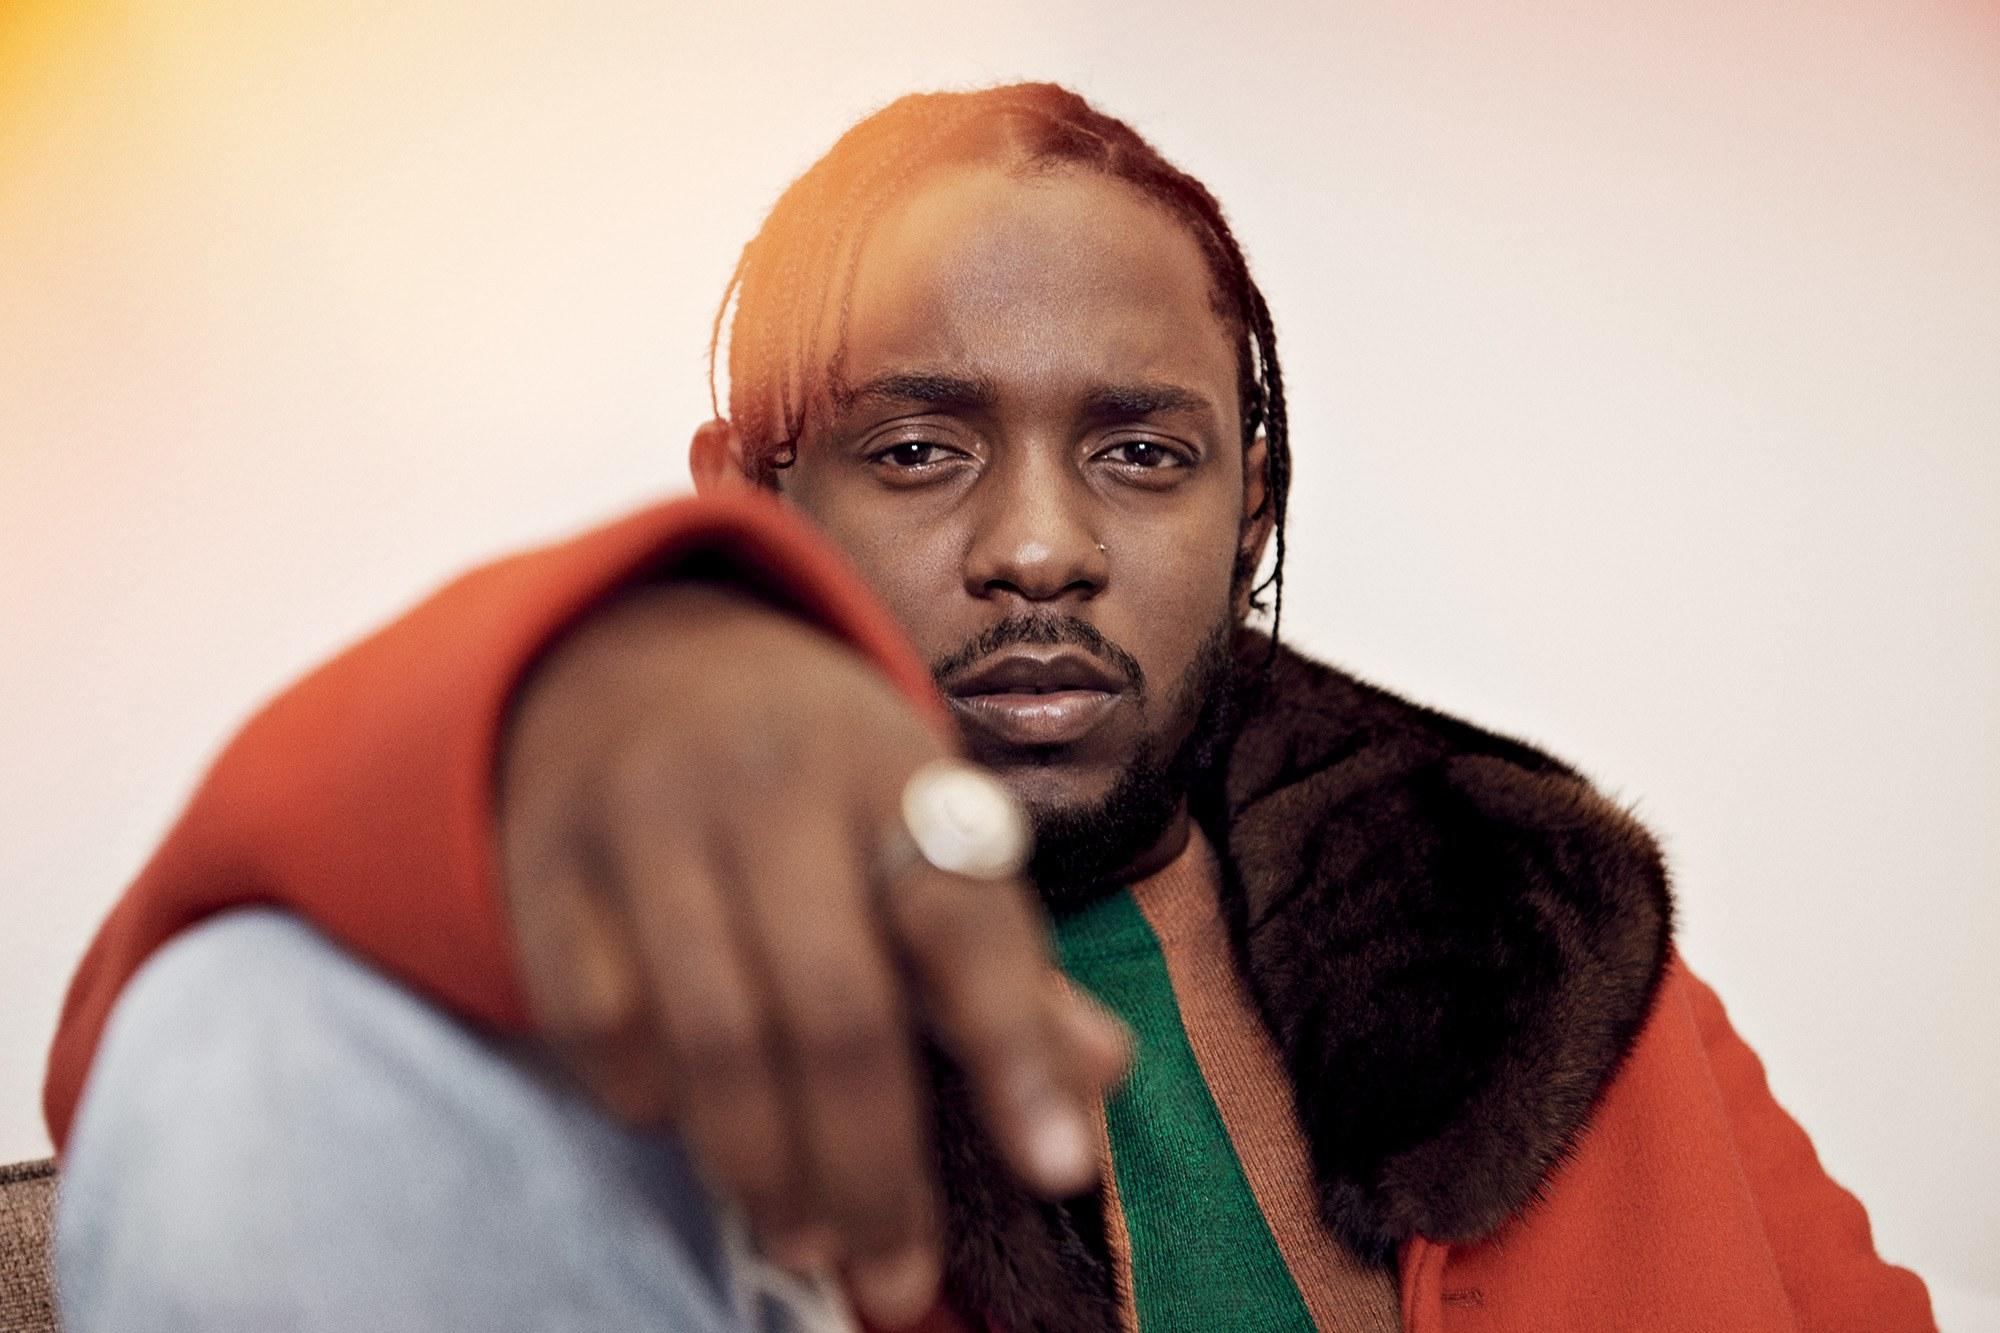 Kendrick Lamar's Net Worth - Plunged in Debt